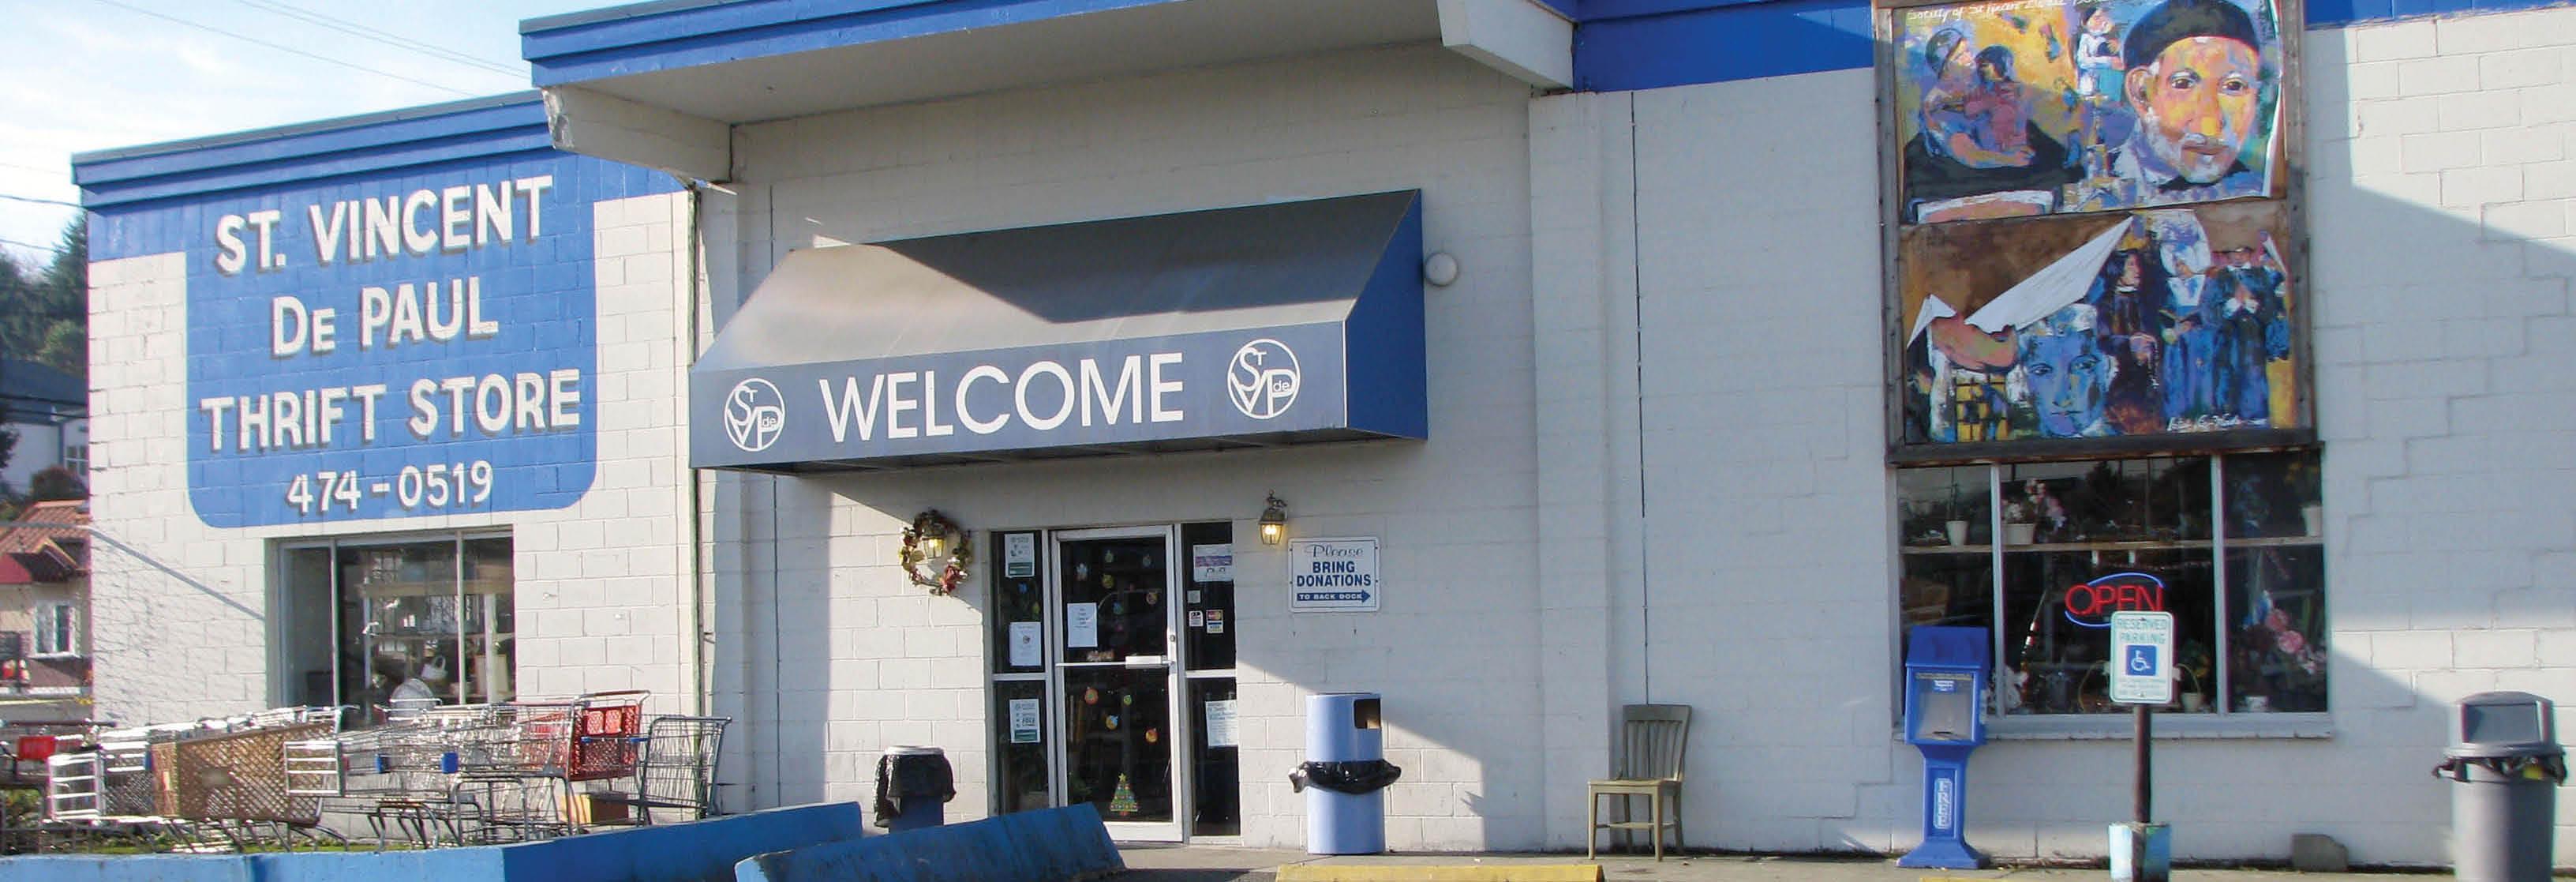 St. Vincent de Paul Thrift Stores main banner image - Tacoma, WA - Puyallup, WA